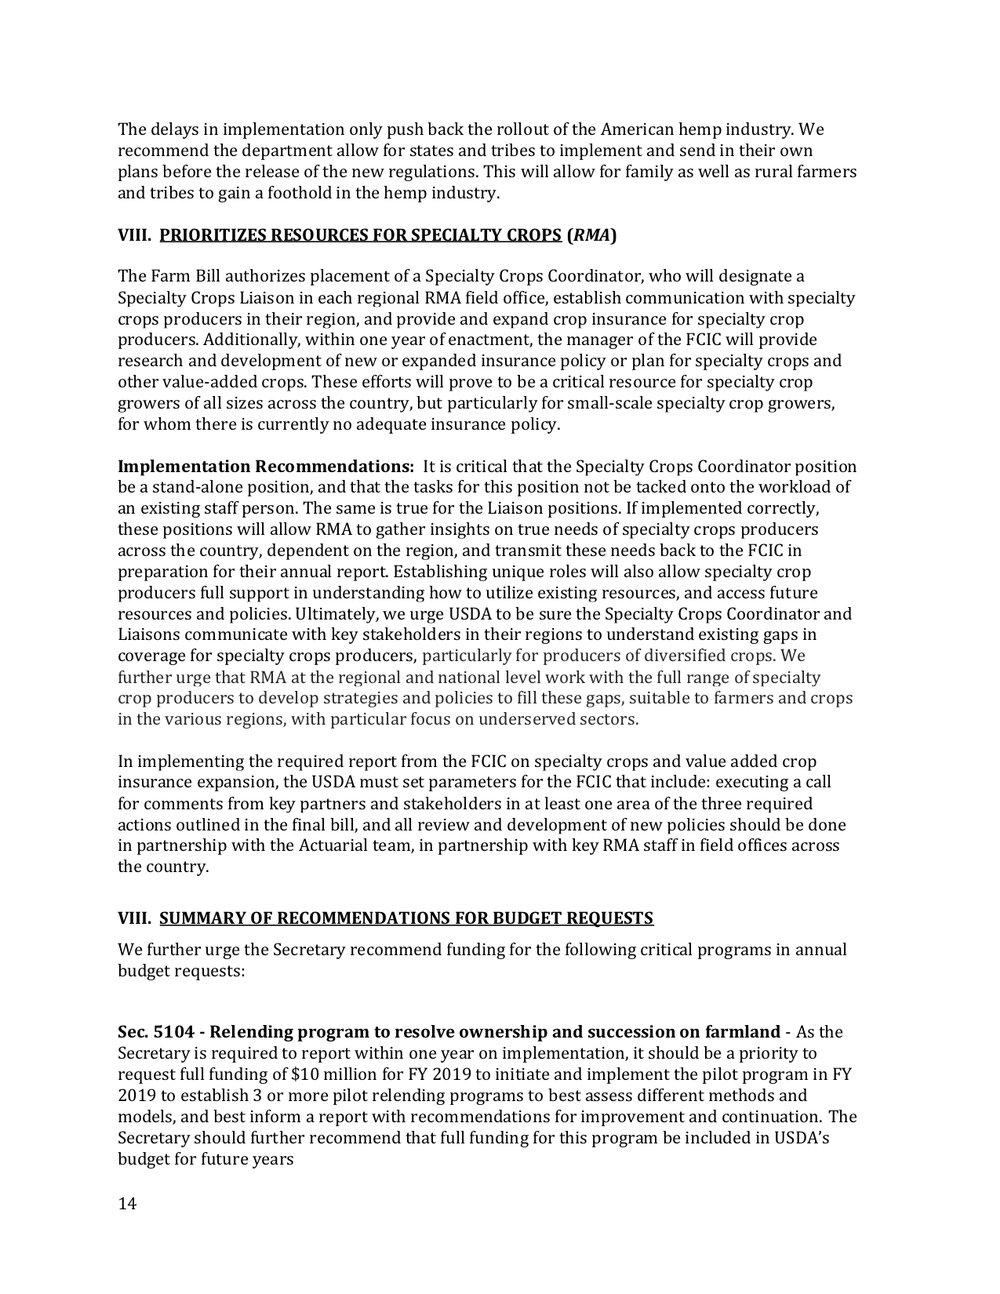 2018 Farm Bill Implementation Recommendations - Rural Co etal final March 1 page 15.jpg